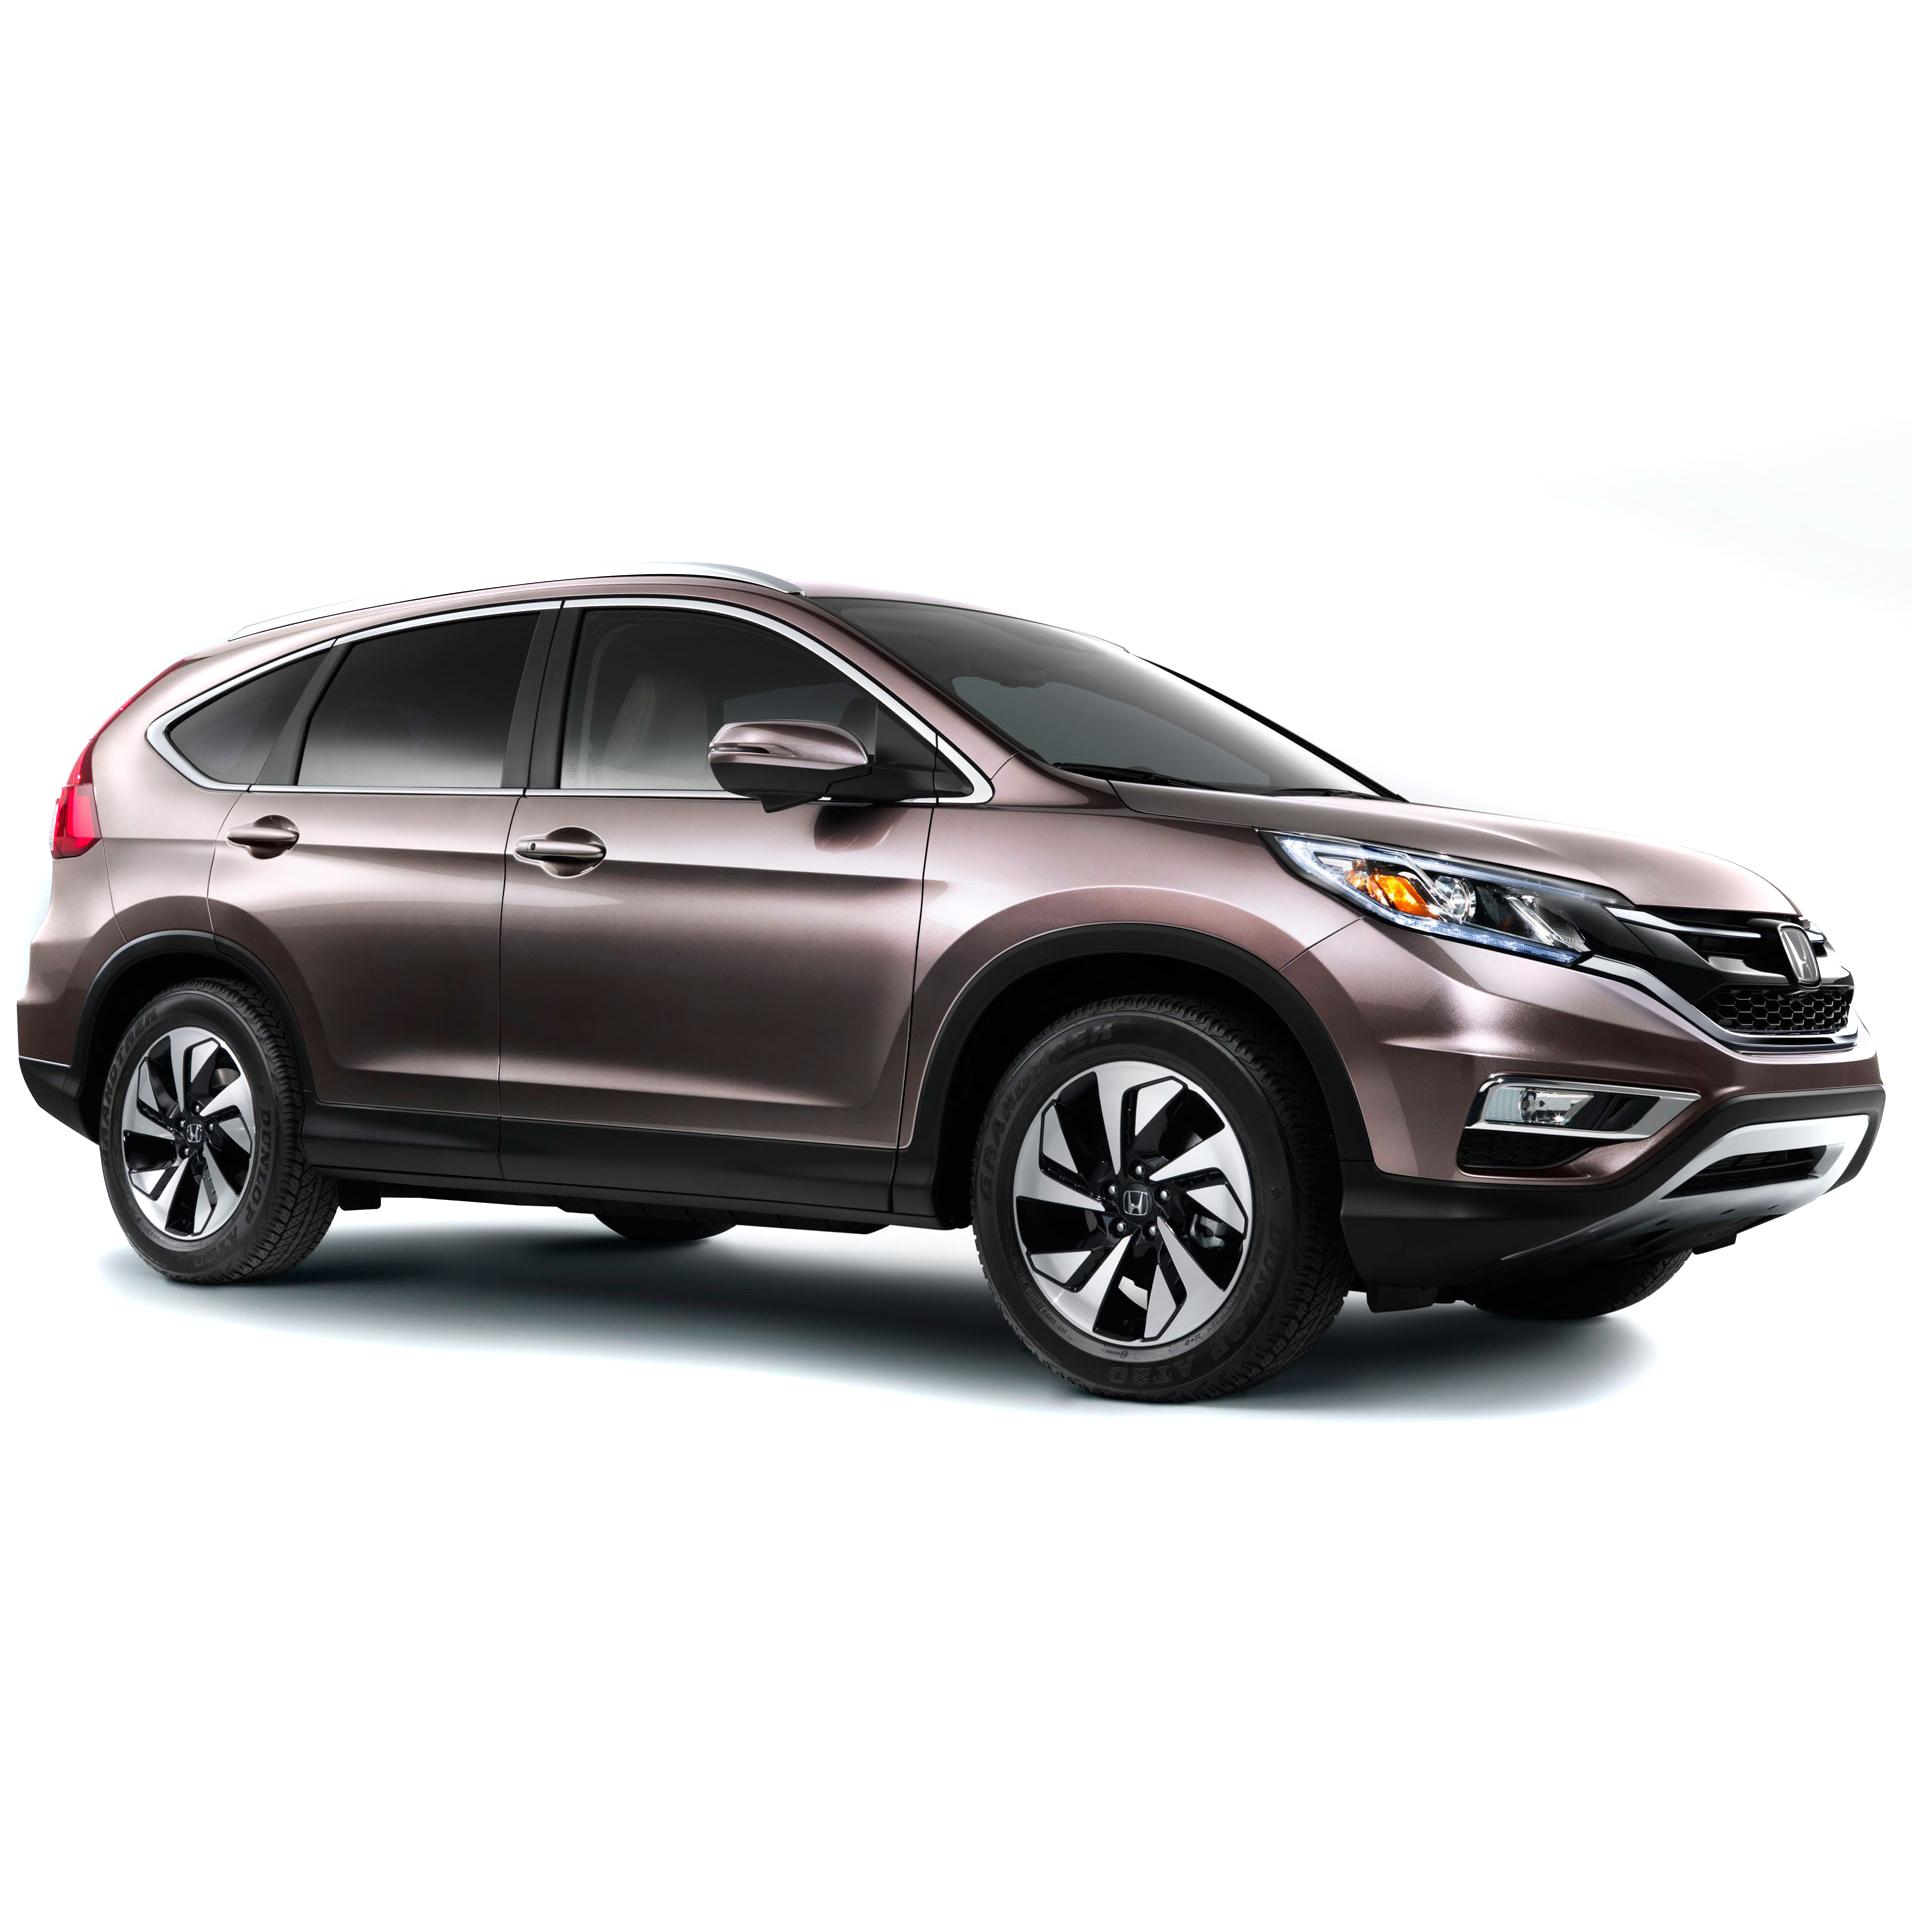 Honda CRV Car Mats (All Models)